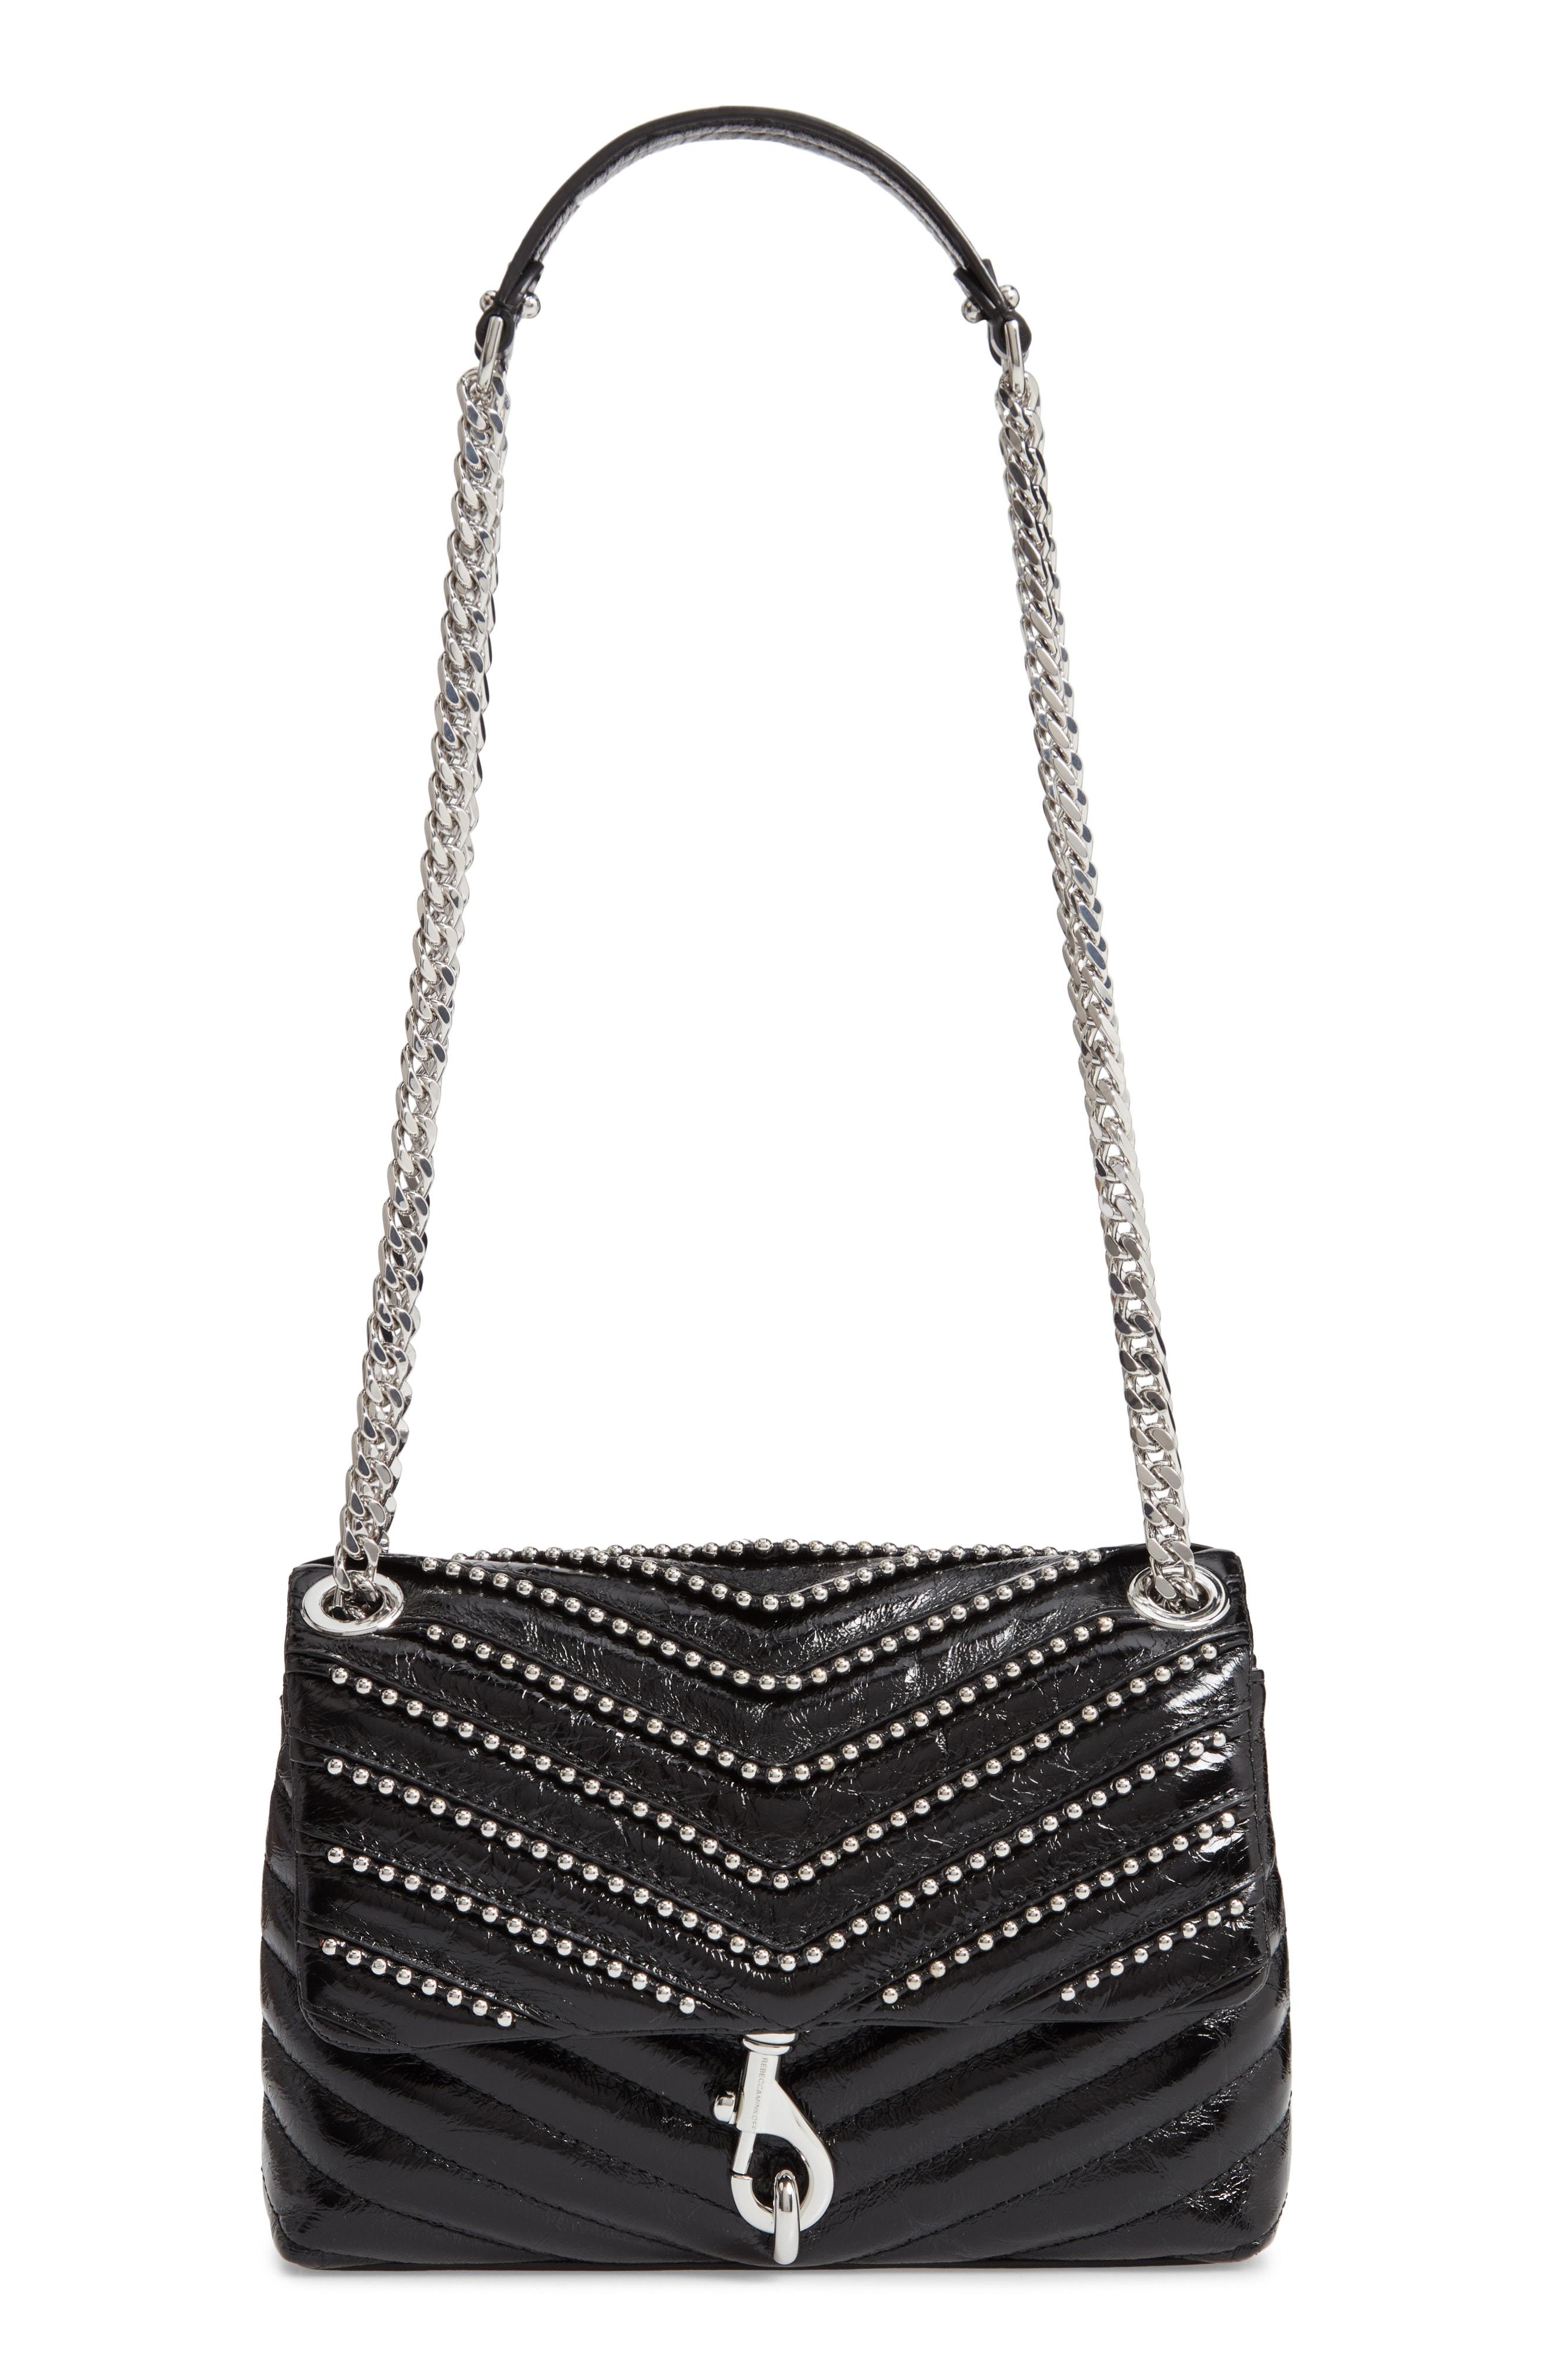 Rebecca Minkoff Edie Beaded Leather Crossbody Bag